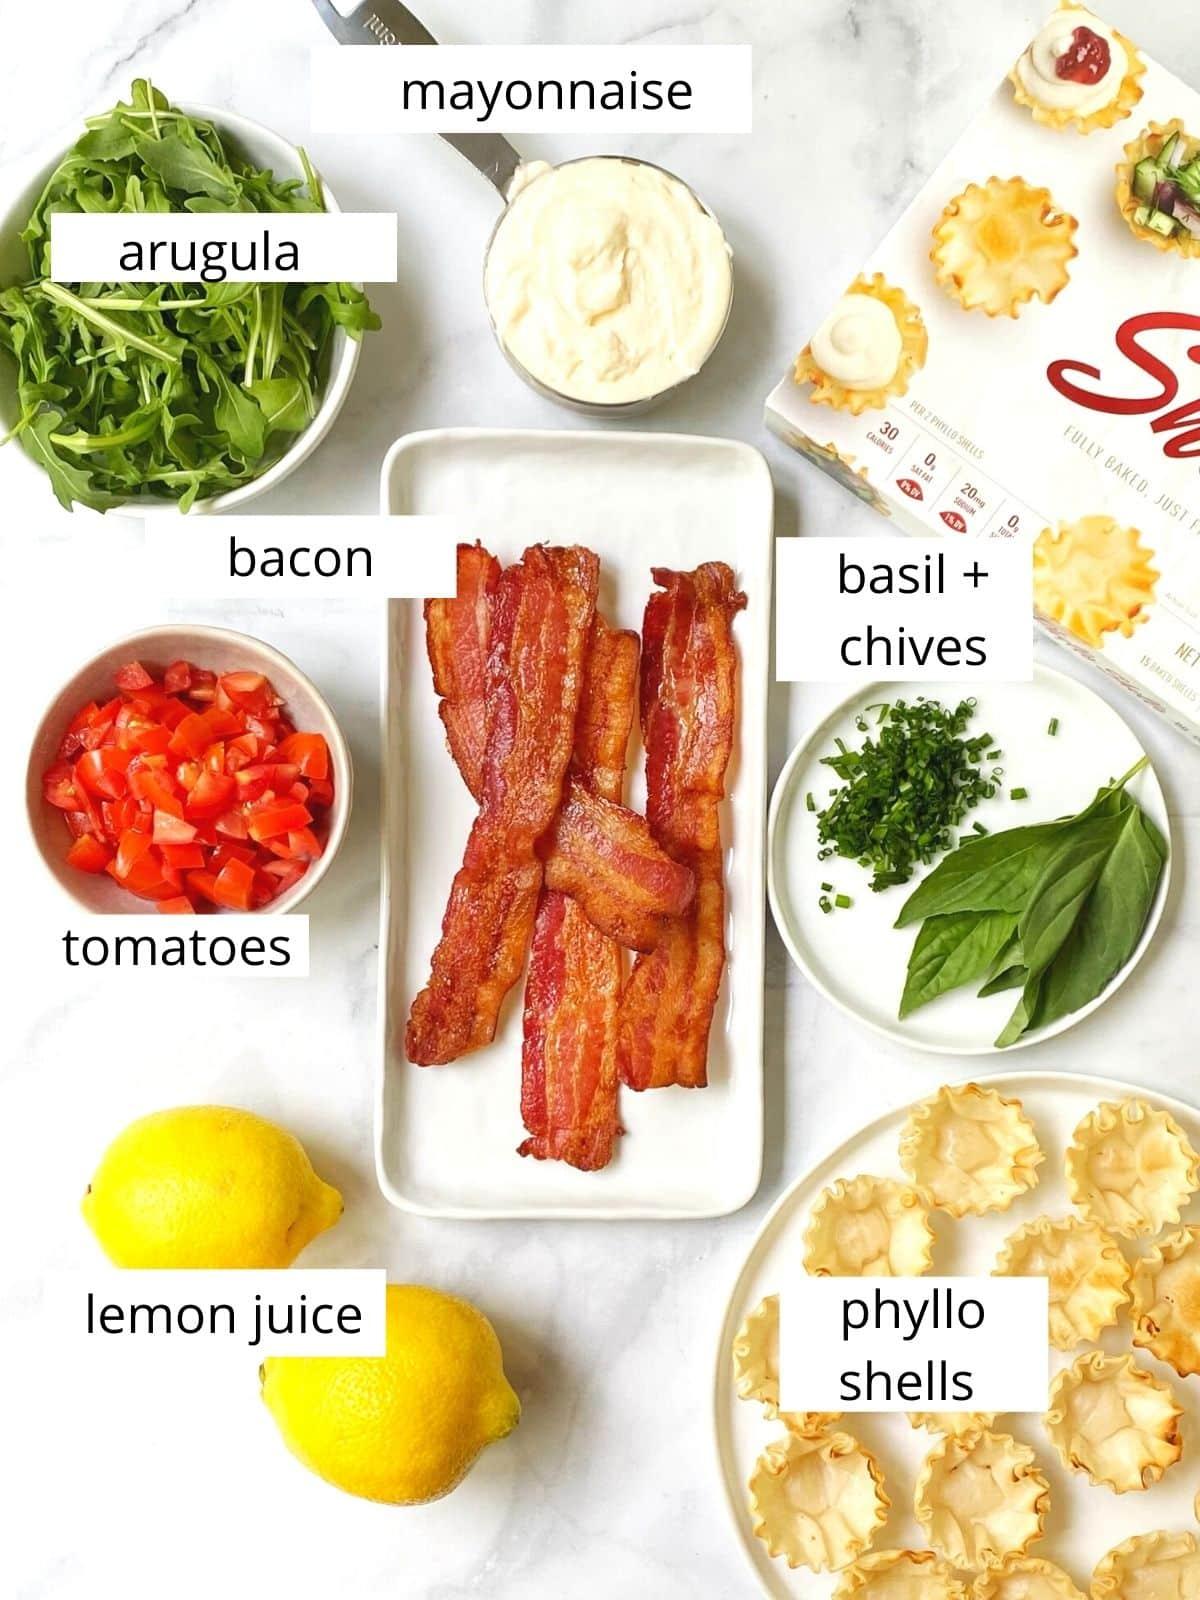 array of ingredients - arugula, mayo, herbs, bacon, tomatoes, lemon, and phyllo shells